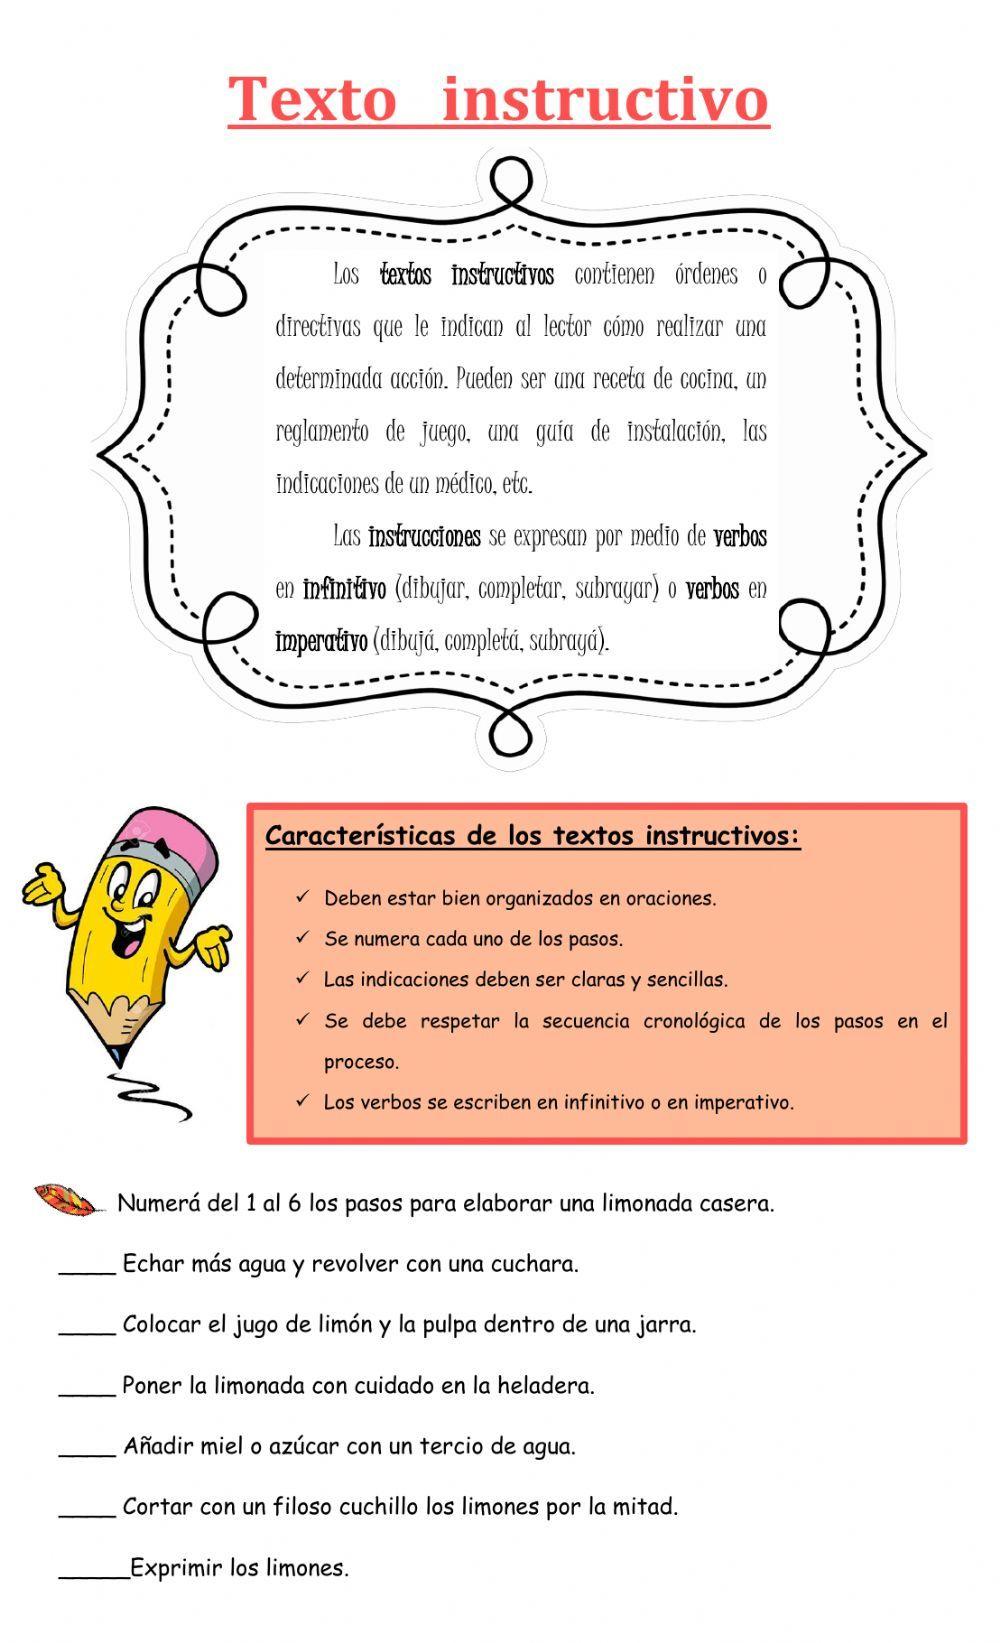 Texto Instructivo Ficha Interactiva Texto Instructivo Para Niños Instructivo Instructivos Para Niños